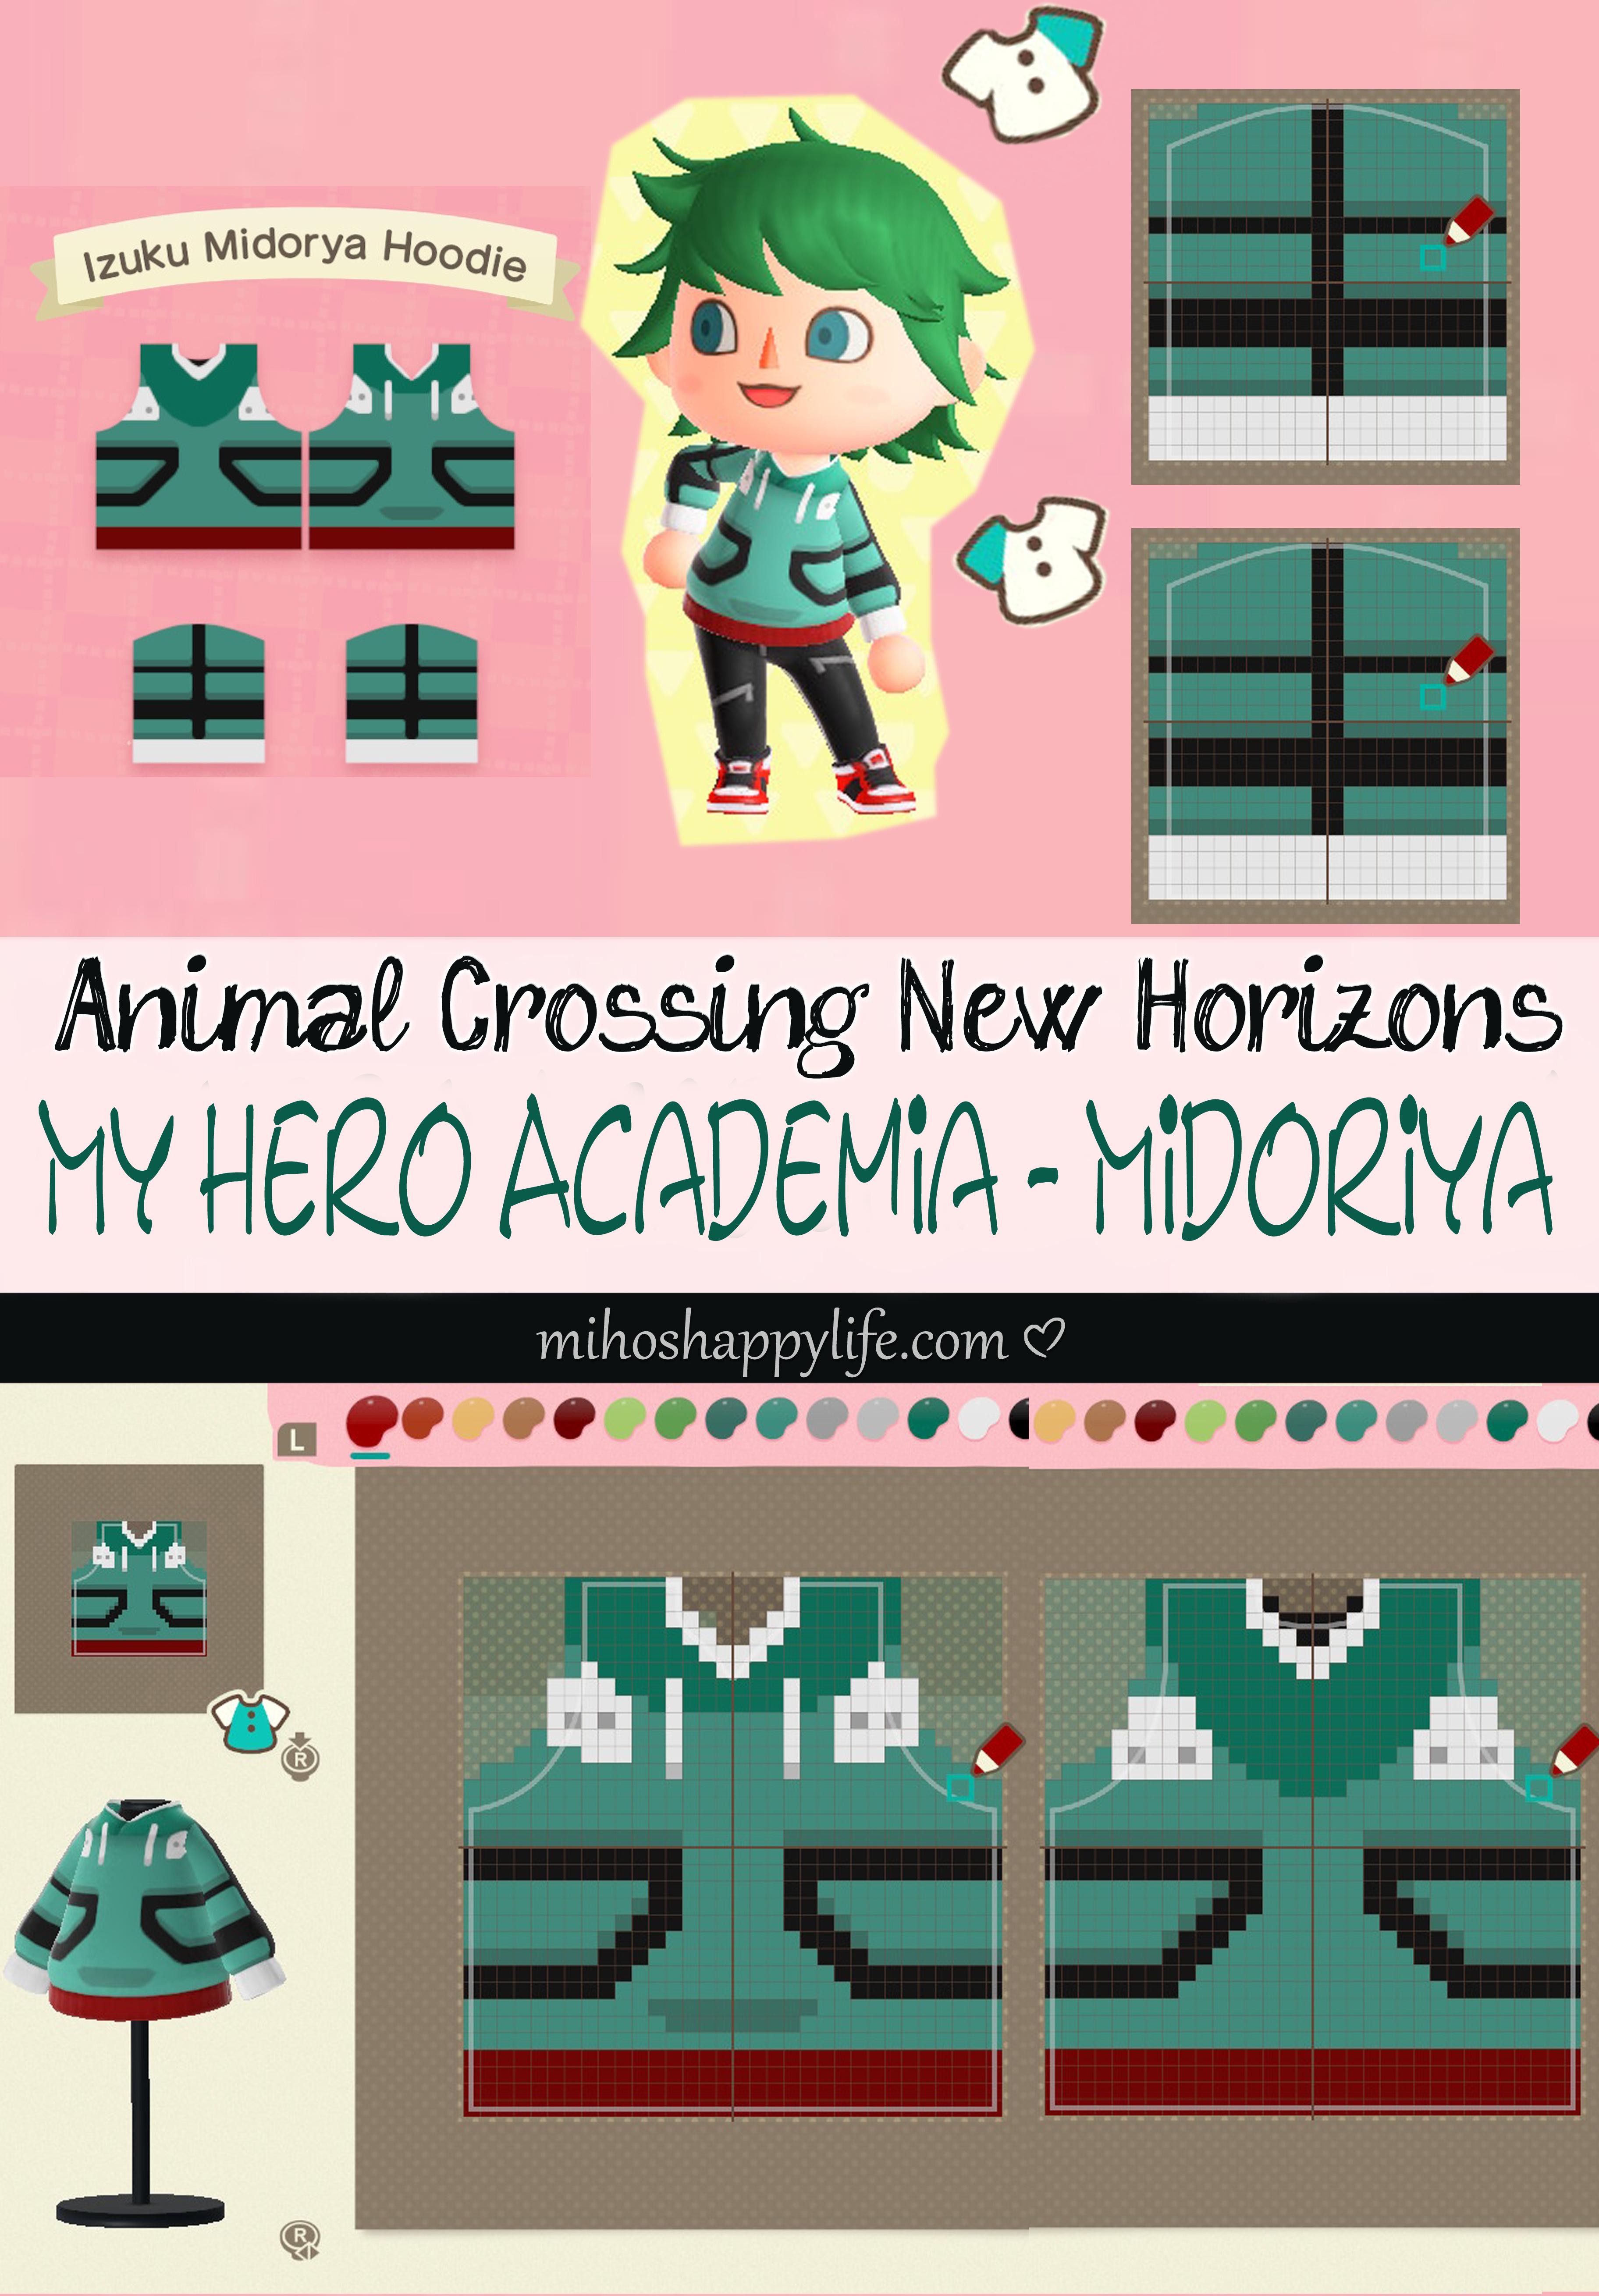 mihoshappylife-animal-crossing-my-hero-academia-midoriya